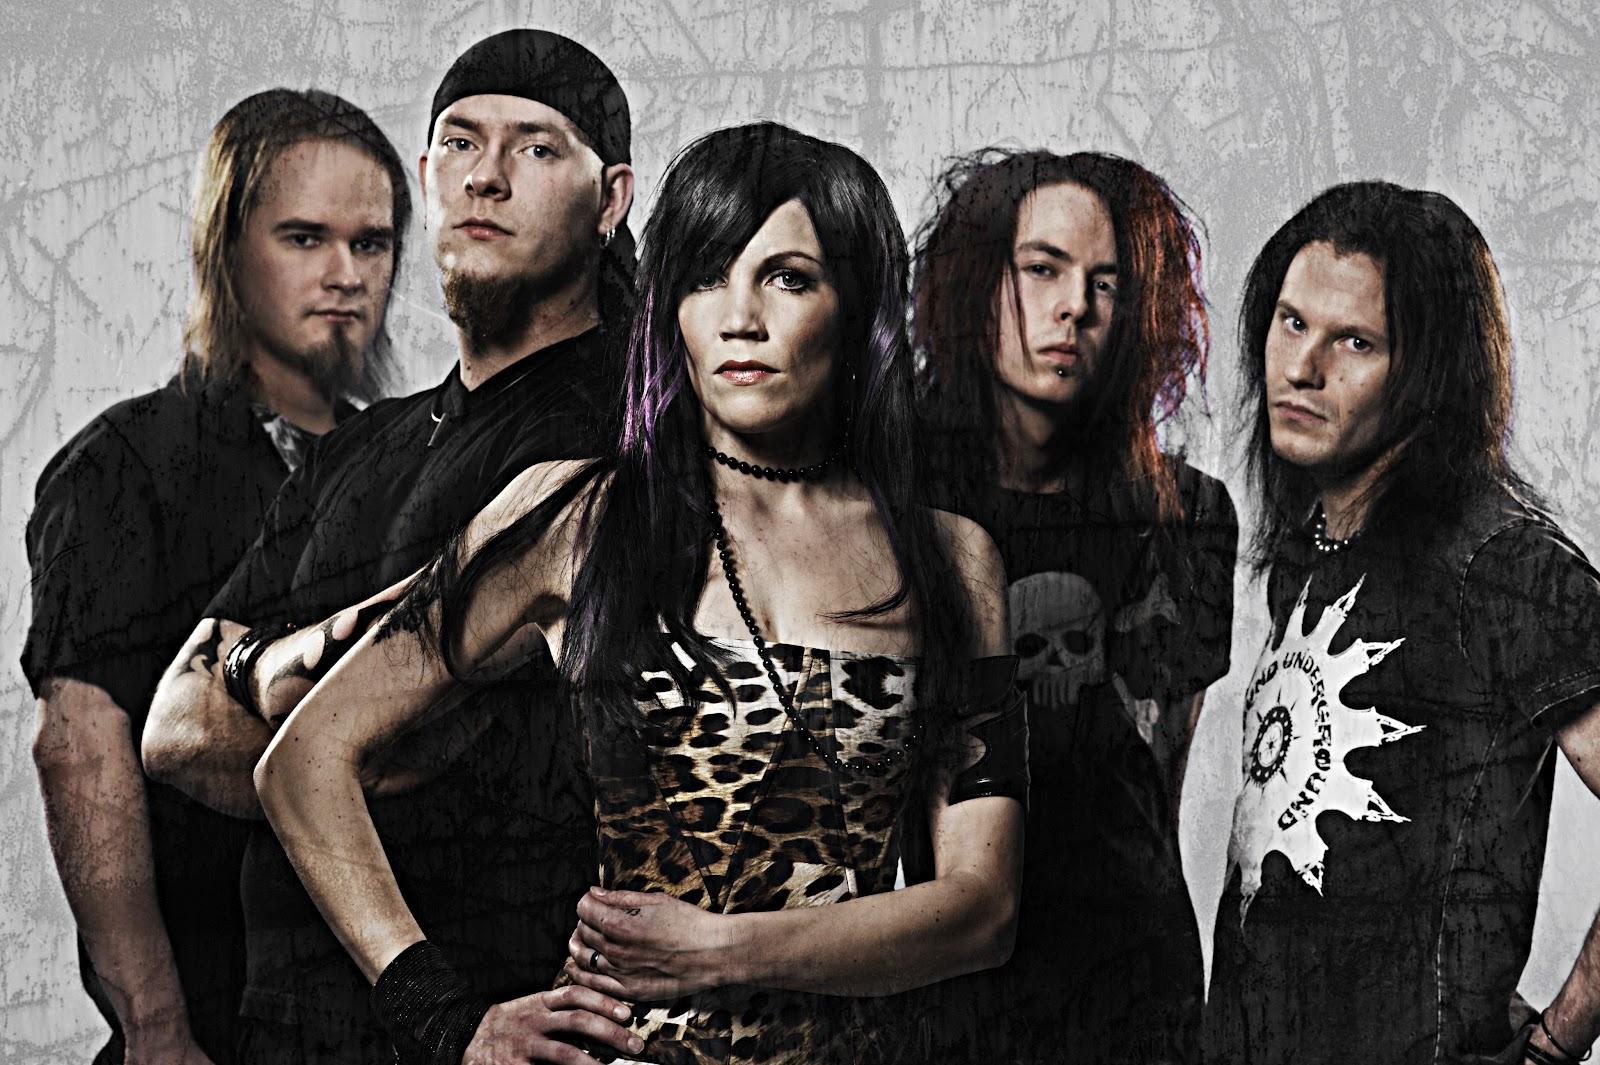 sirens of darkness list of female metal bands part 9. Black Bedroom Furniture Sets. Home Design Ideas